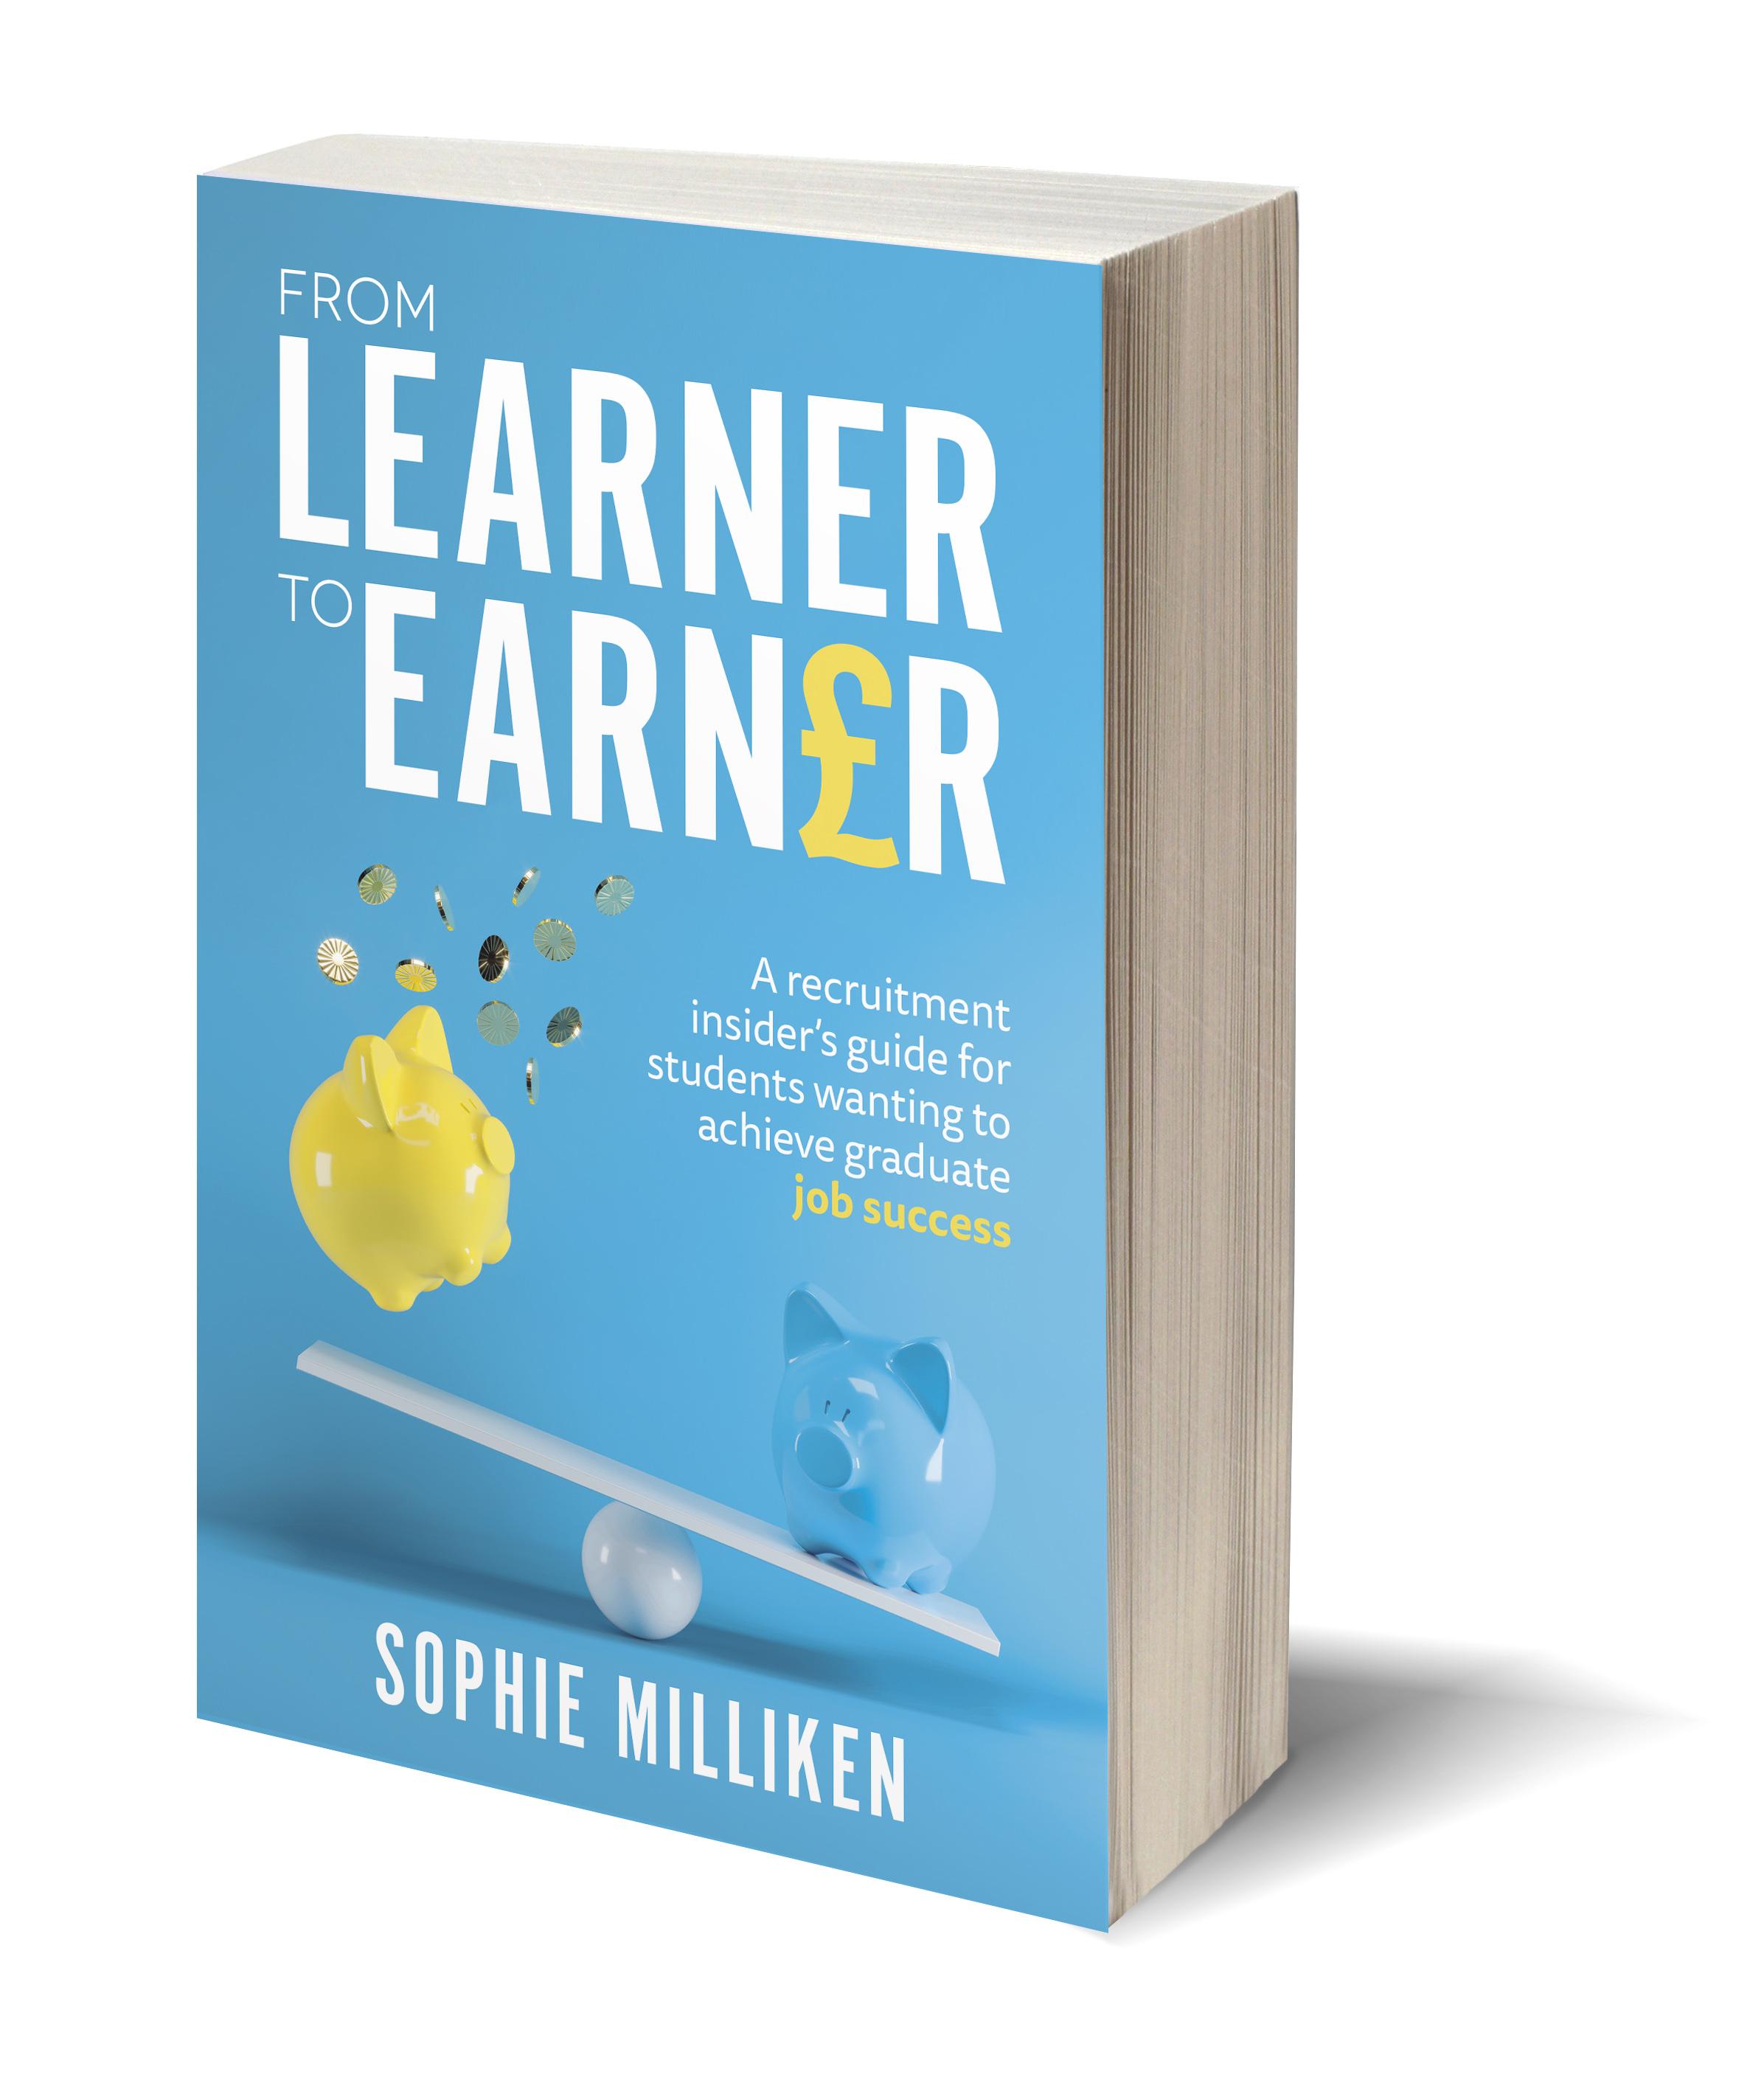 From Learner To Earner Sophie Milliken